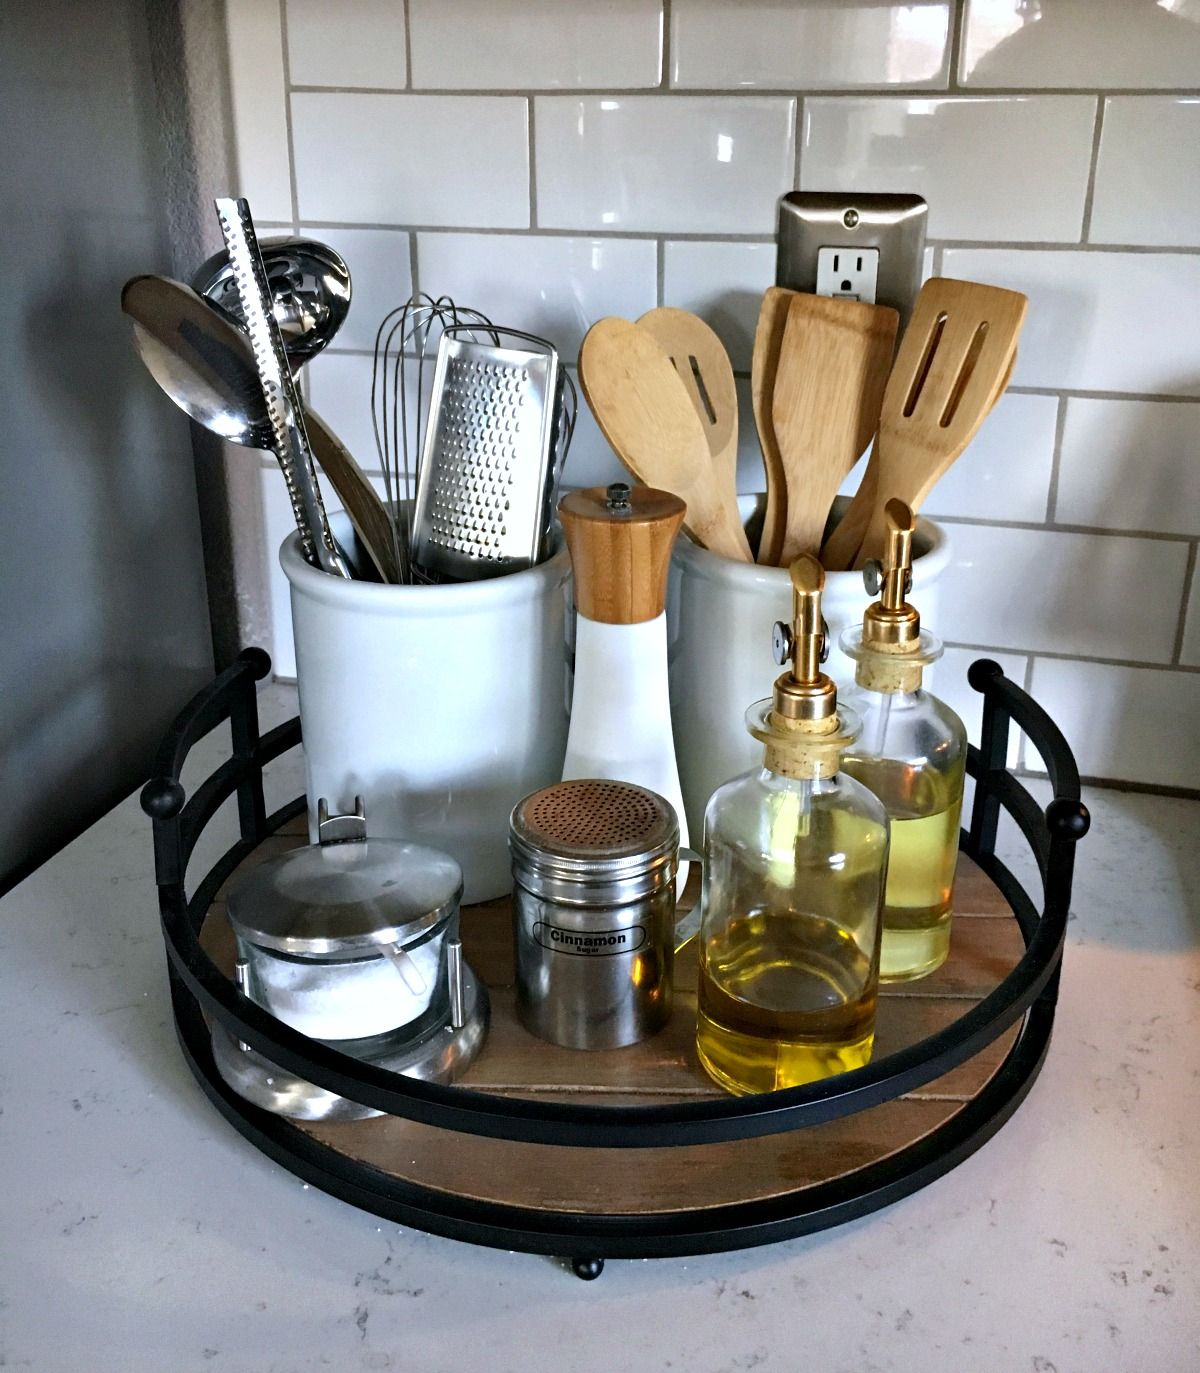 5 Organizers Every Kitchen Needs Where To Buy Decoracion De Cocina Modelos De Cocinas Cocinas